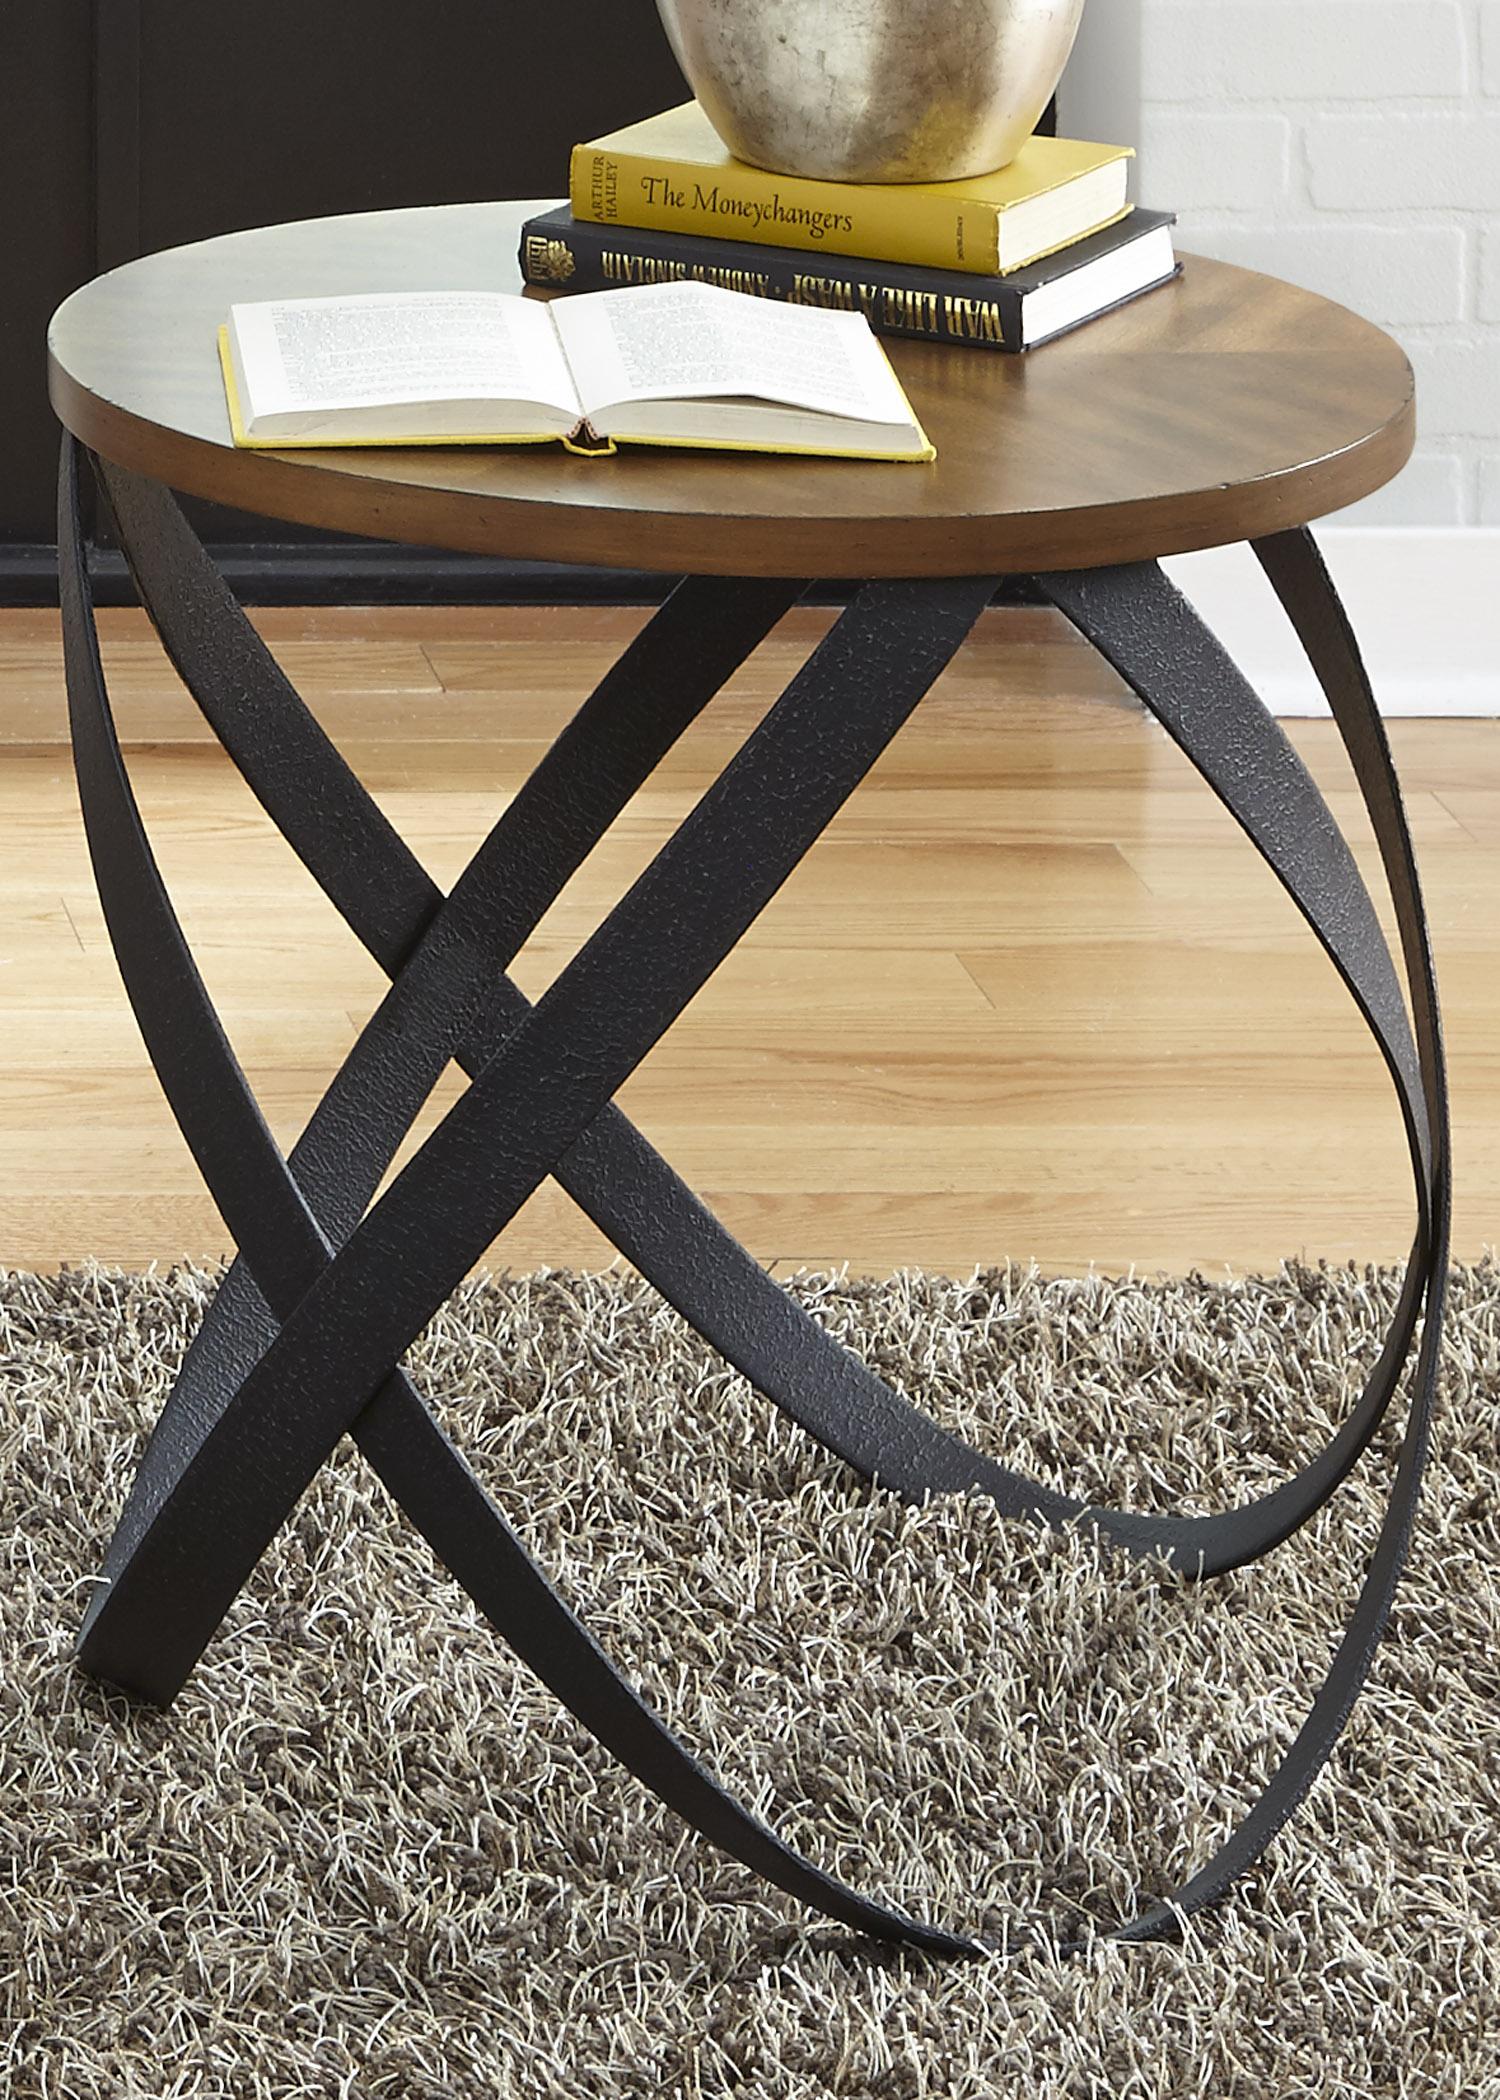 Liberty Furniture Lancaster End Table                                    - Item Number: 81-OT1020